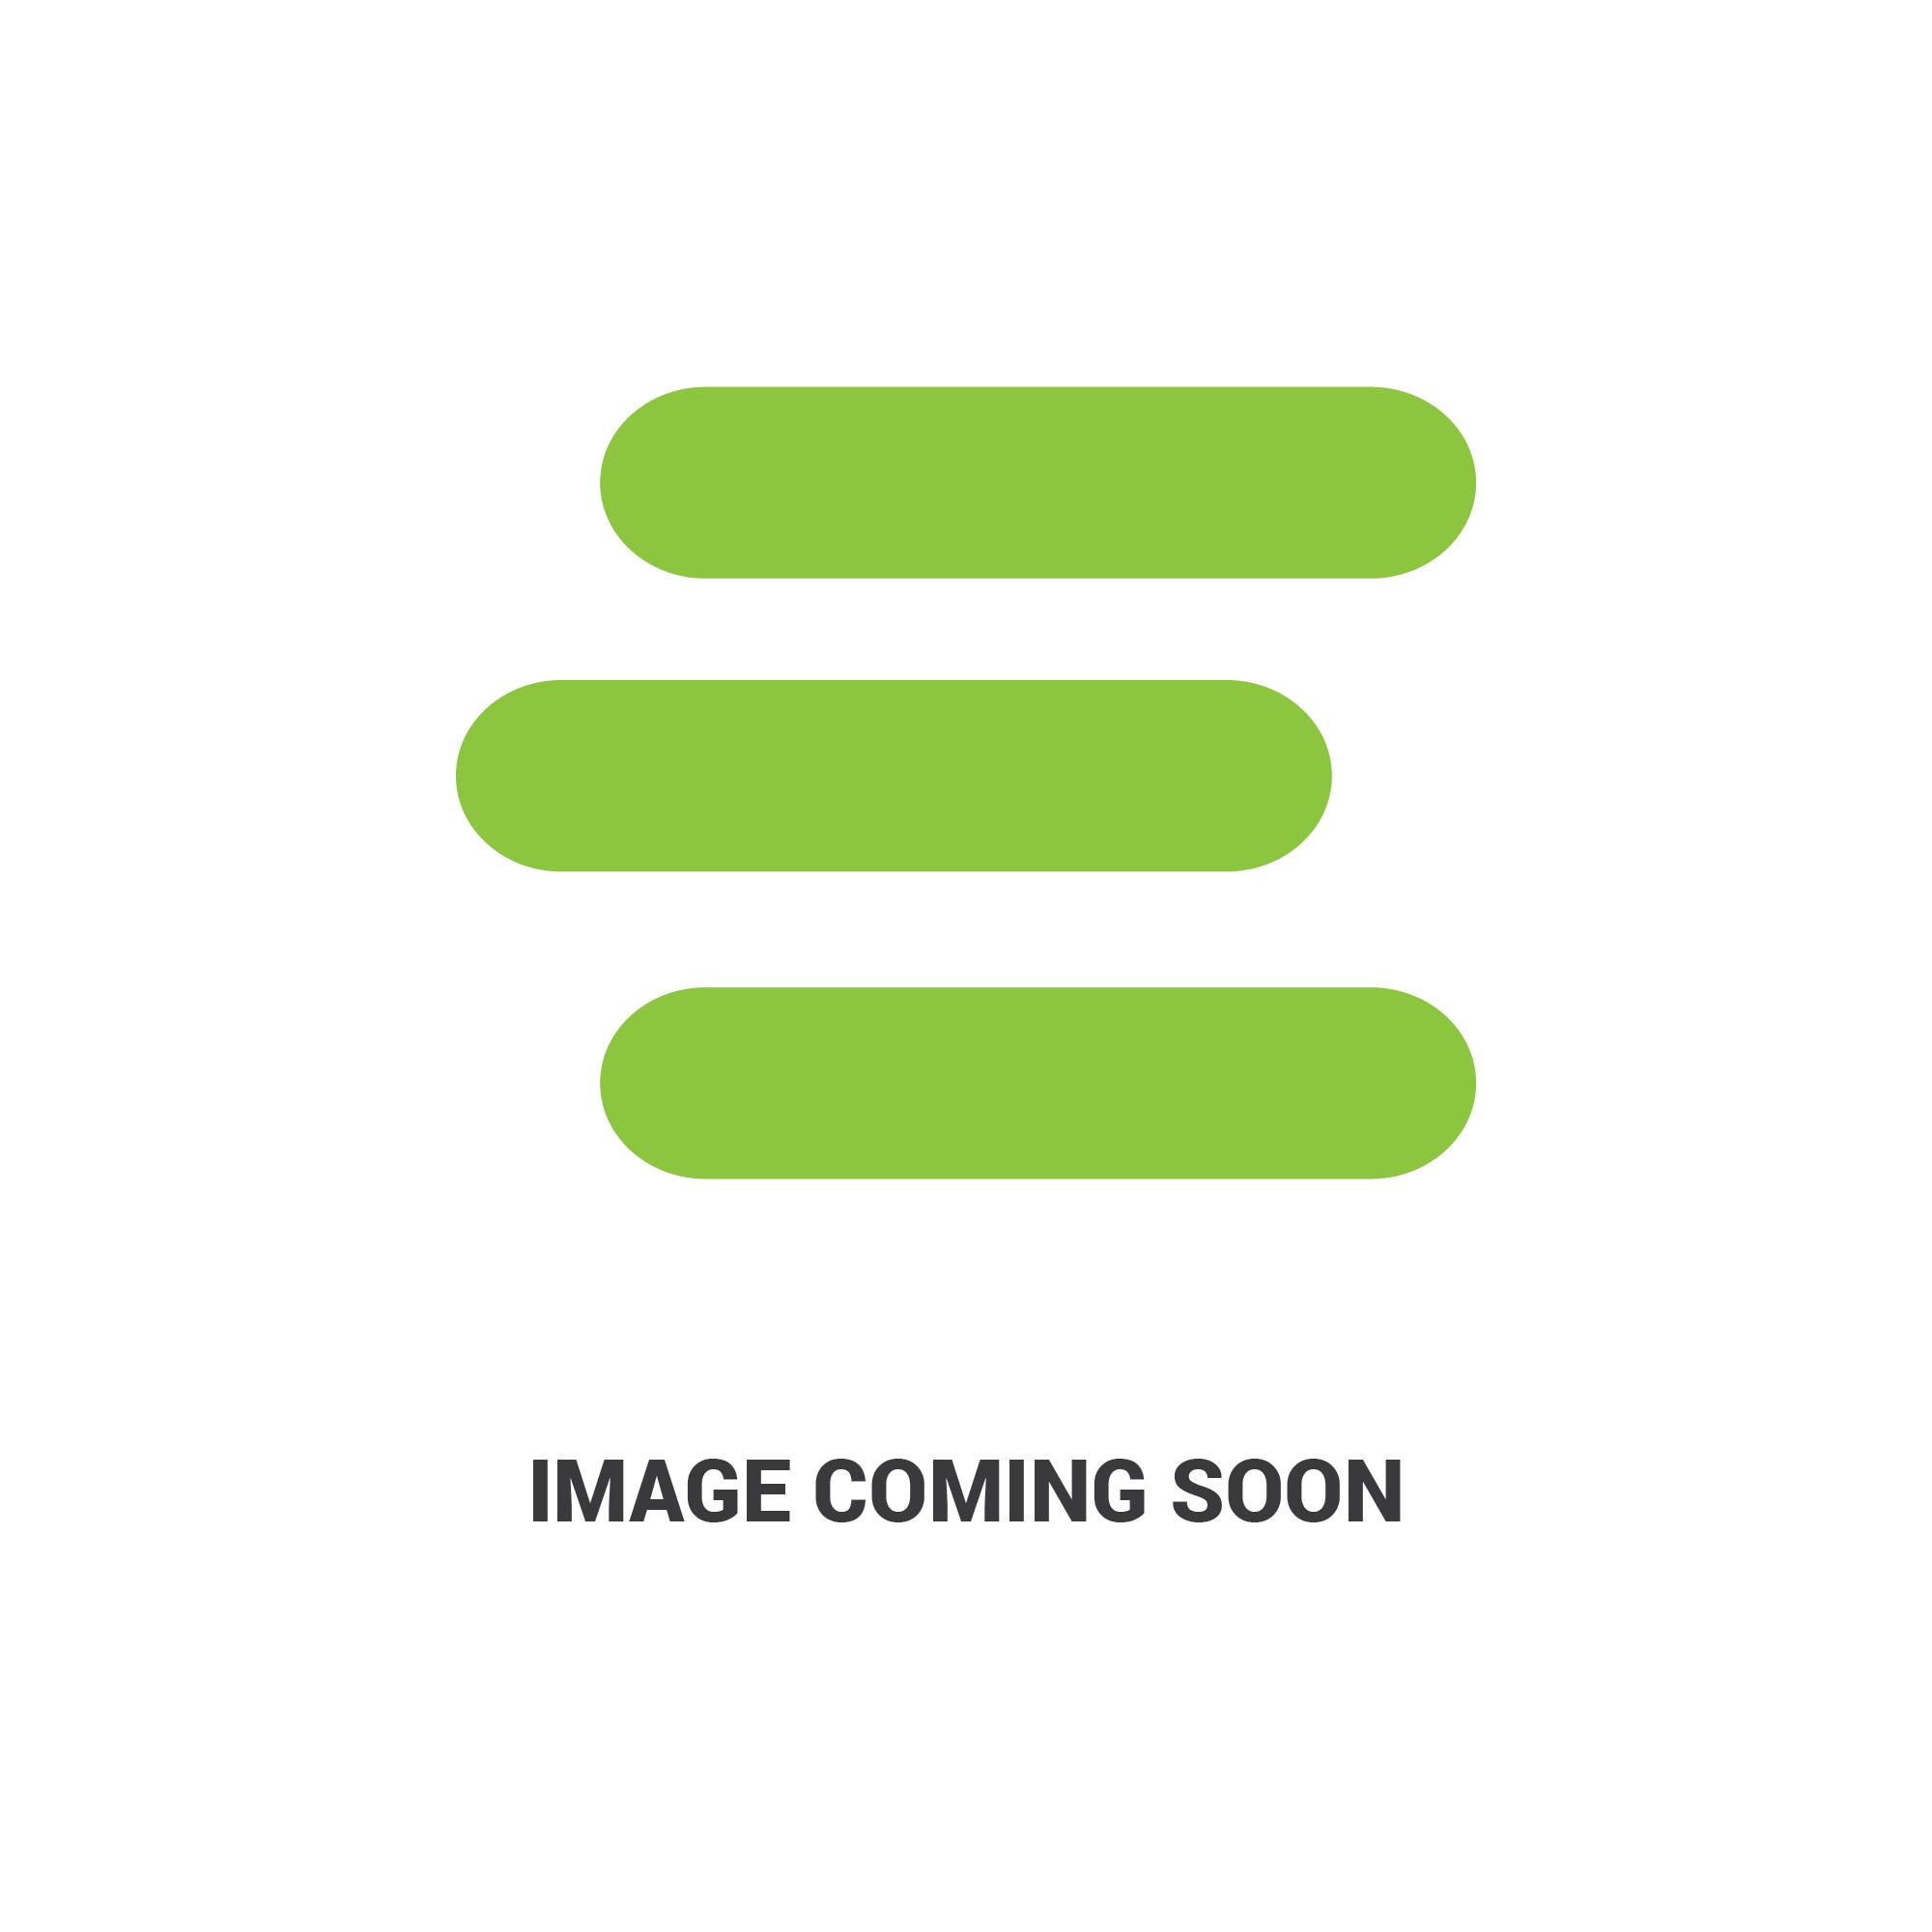 E-6C040-561232266_1 0.jpg